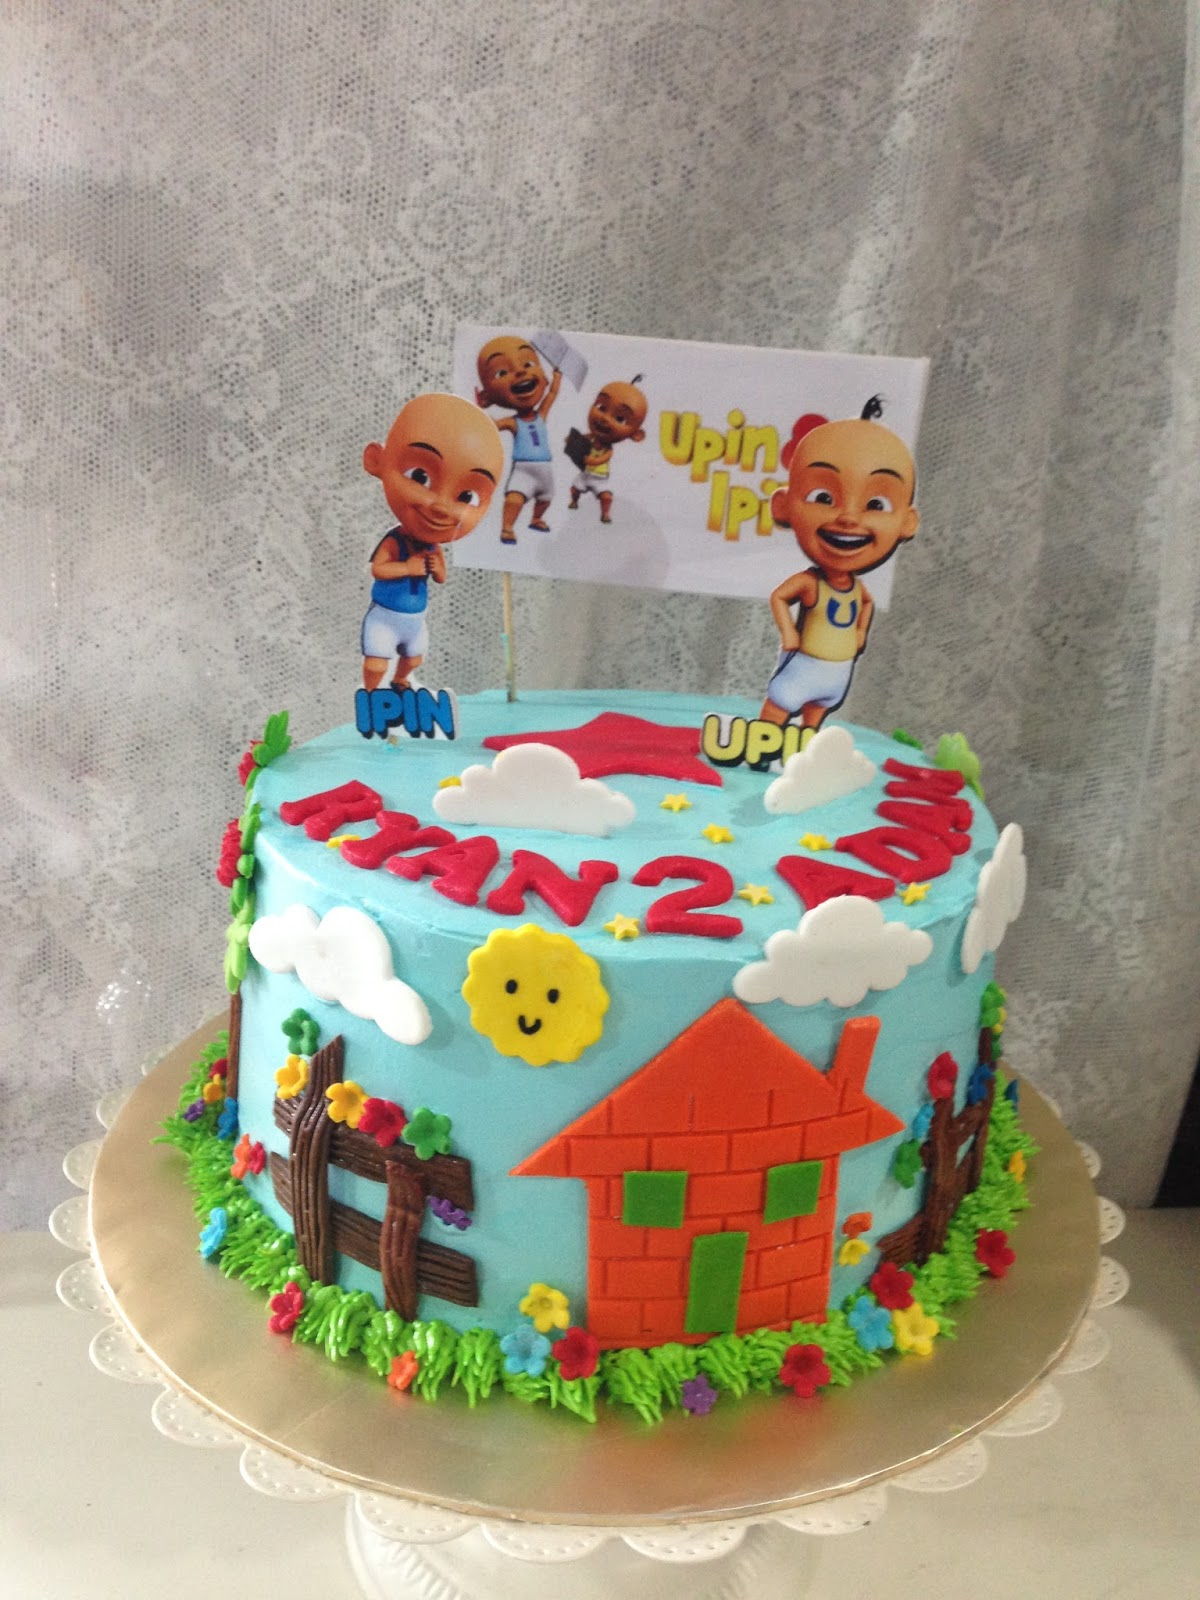 ninie cakes house Upin Ipin Fondant Birthday Cake